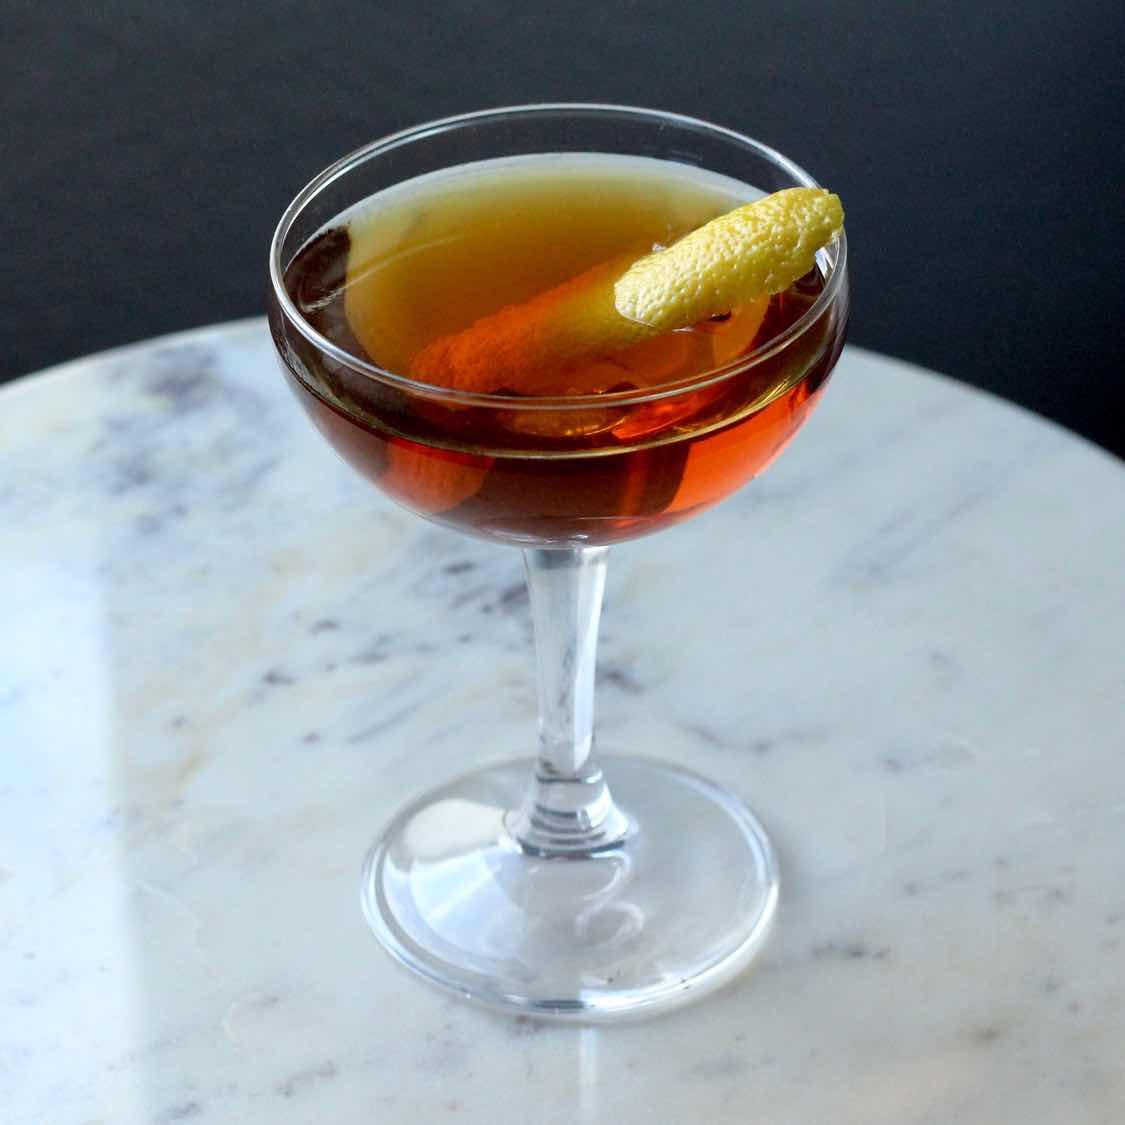 Pre-Prohibition Manhattan Cocktail | Original 1880 - 1920 Recipe